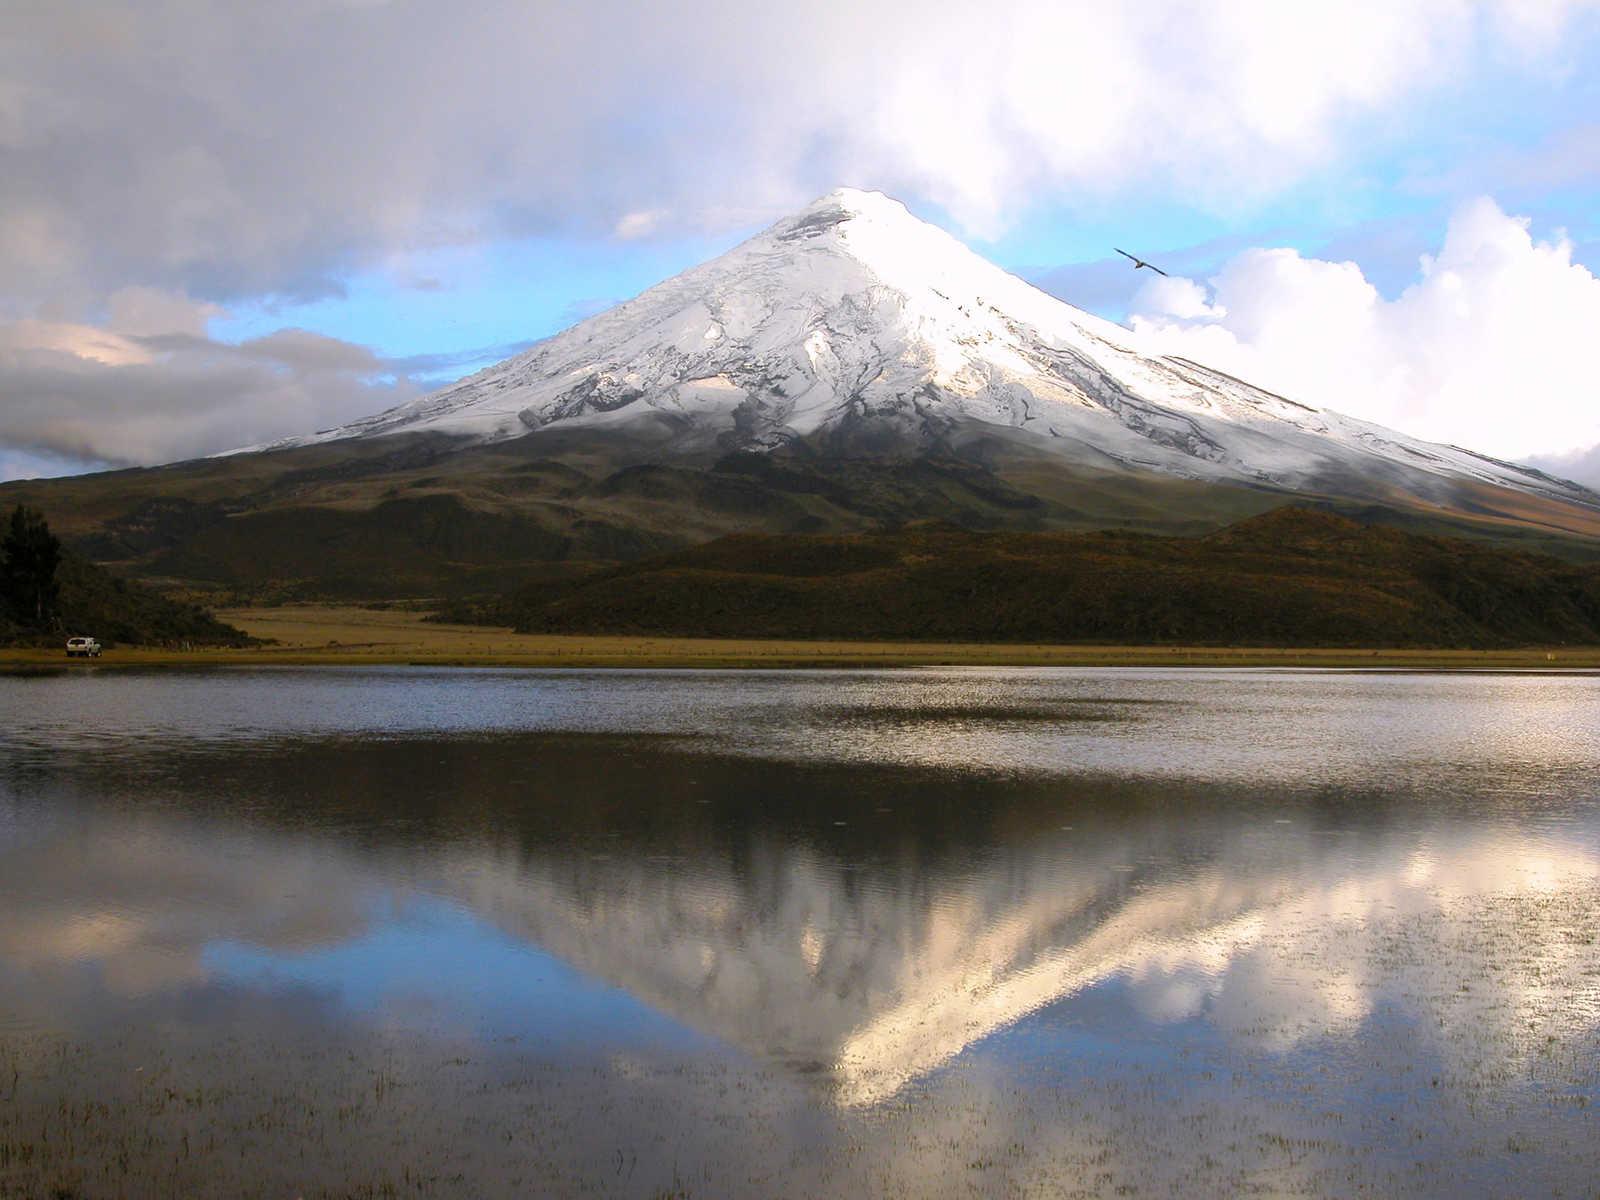 Ecuador (Andes and Amazon)